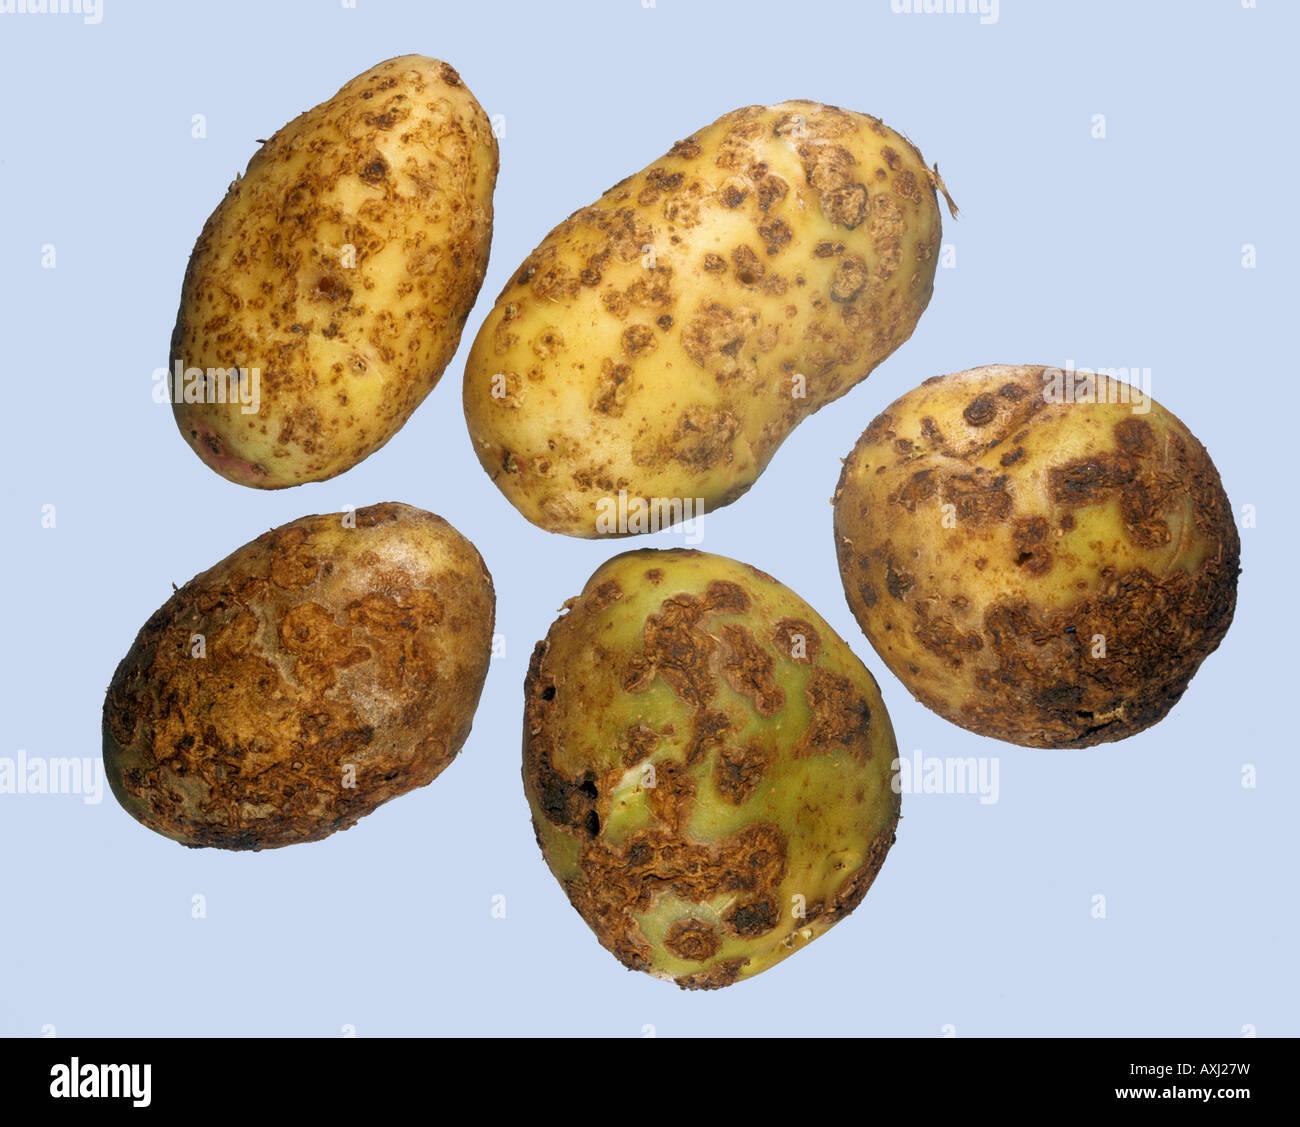 Common scab Streptomyces scabies disease symptoms on potato tubers